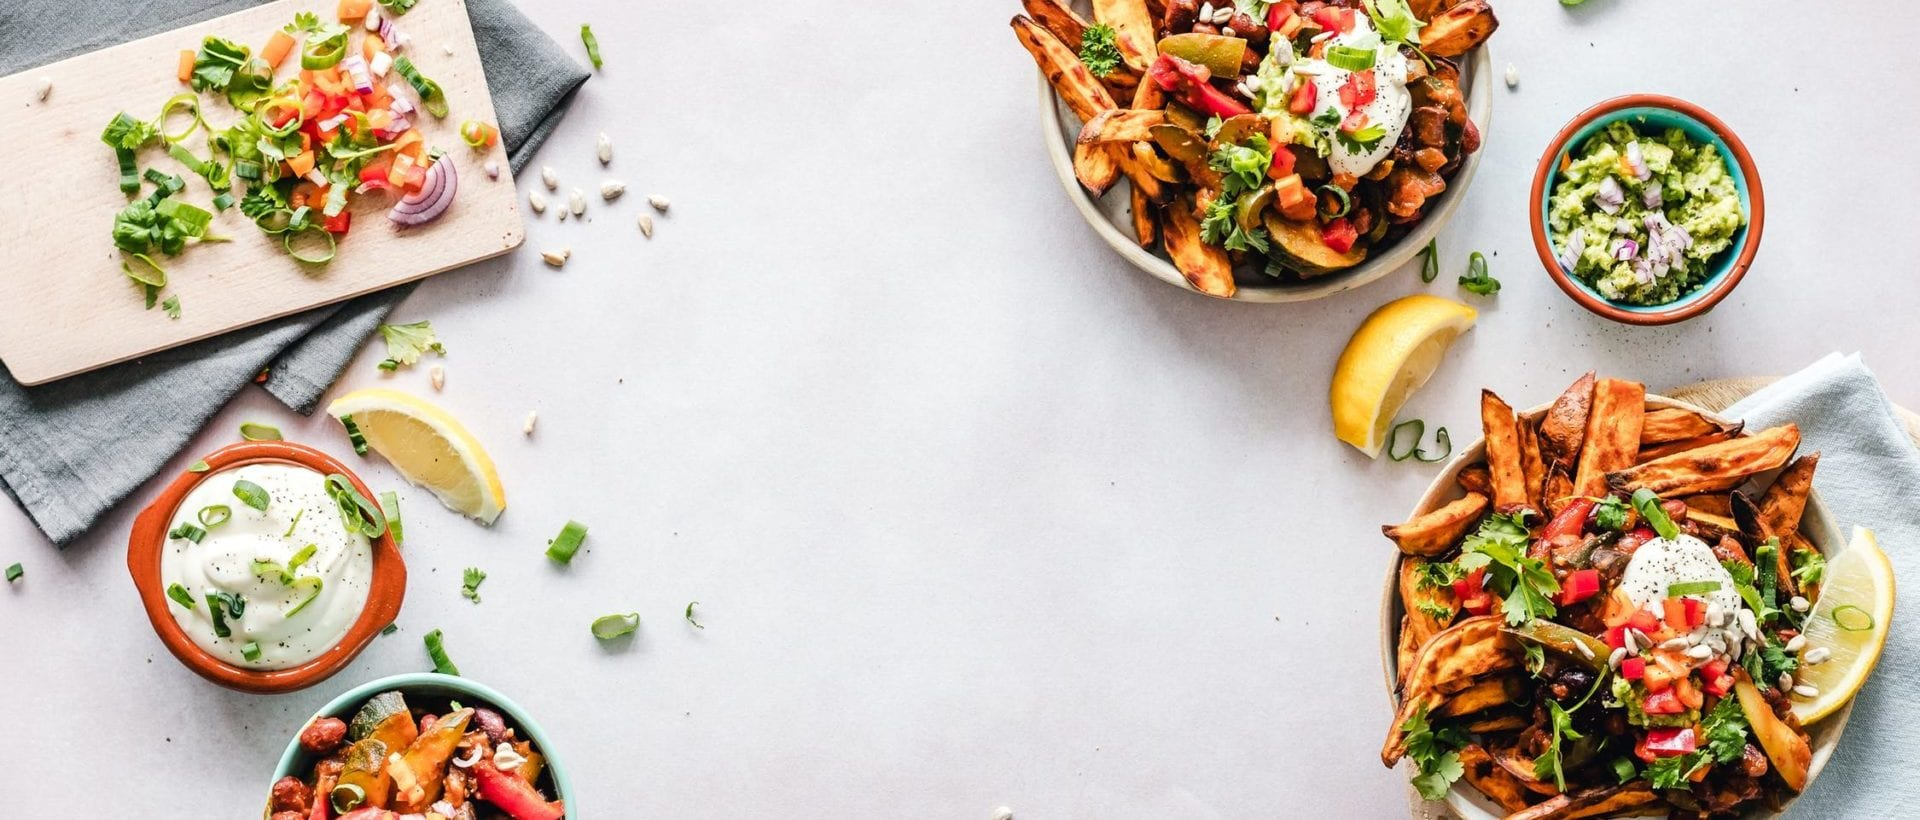 healthy eating habits advice